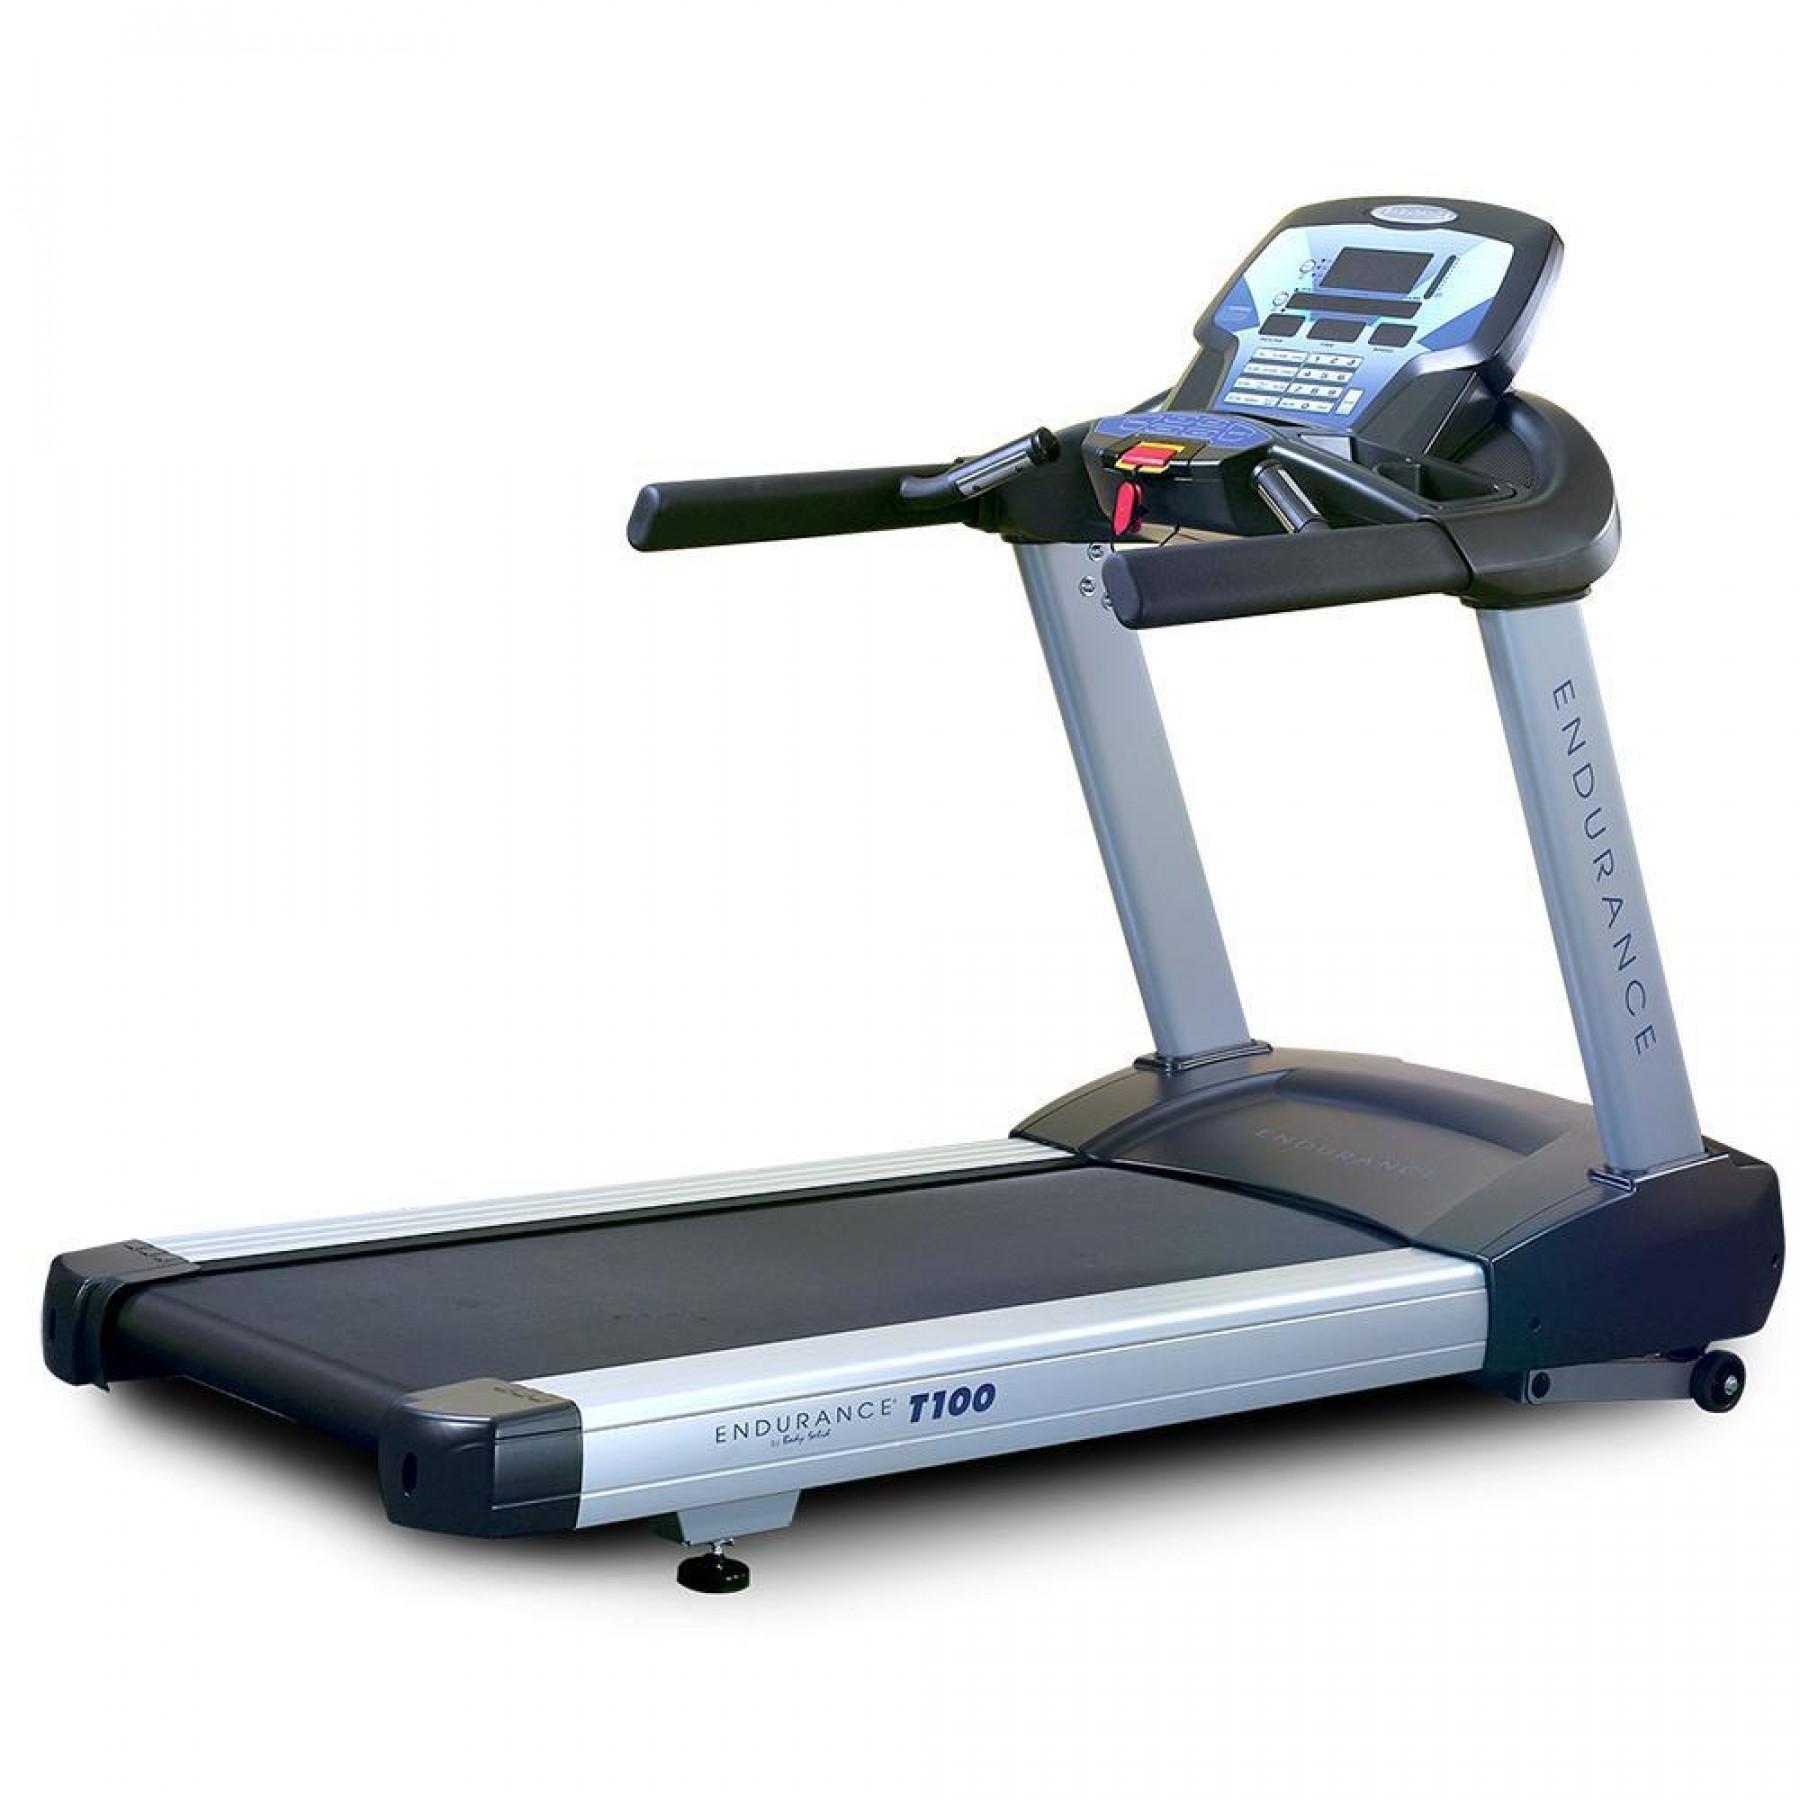 Tapis de course Endurance T100 Treadmill Endurance